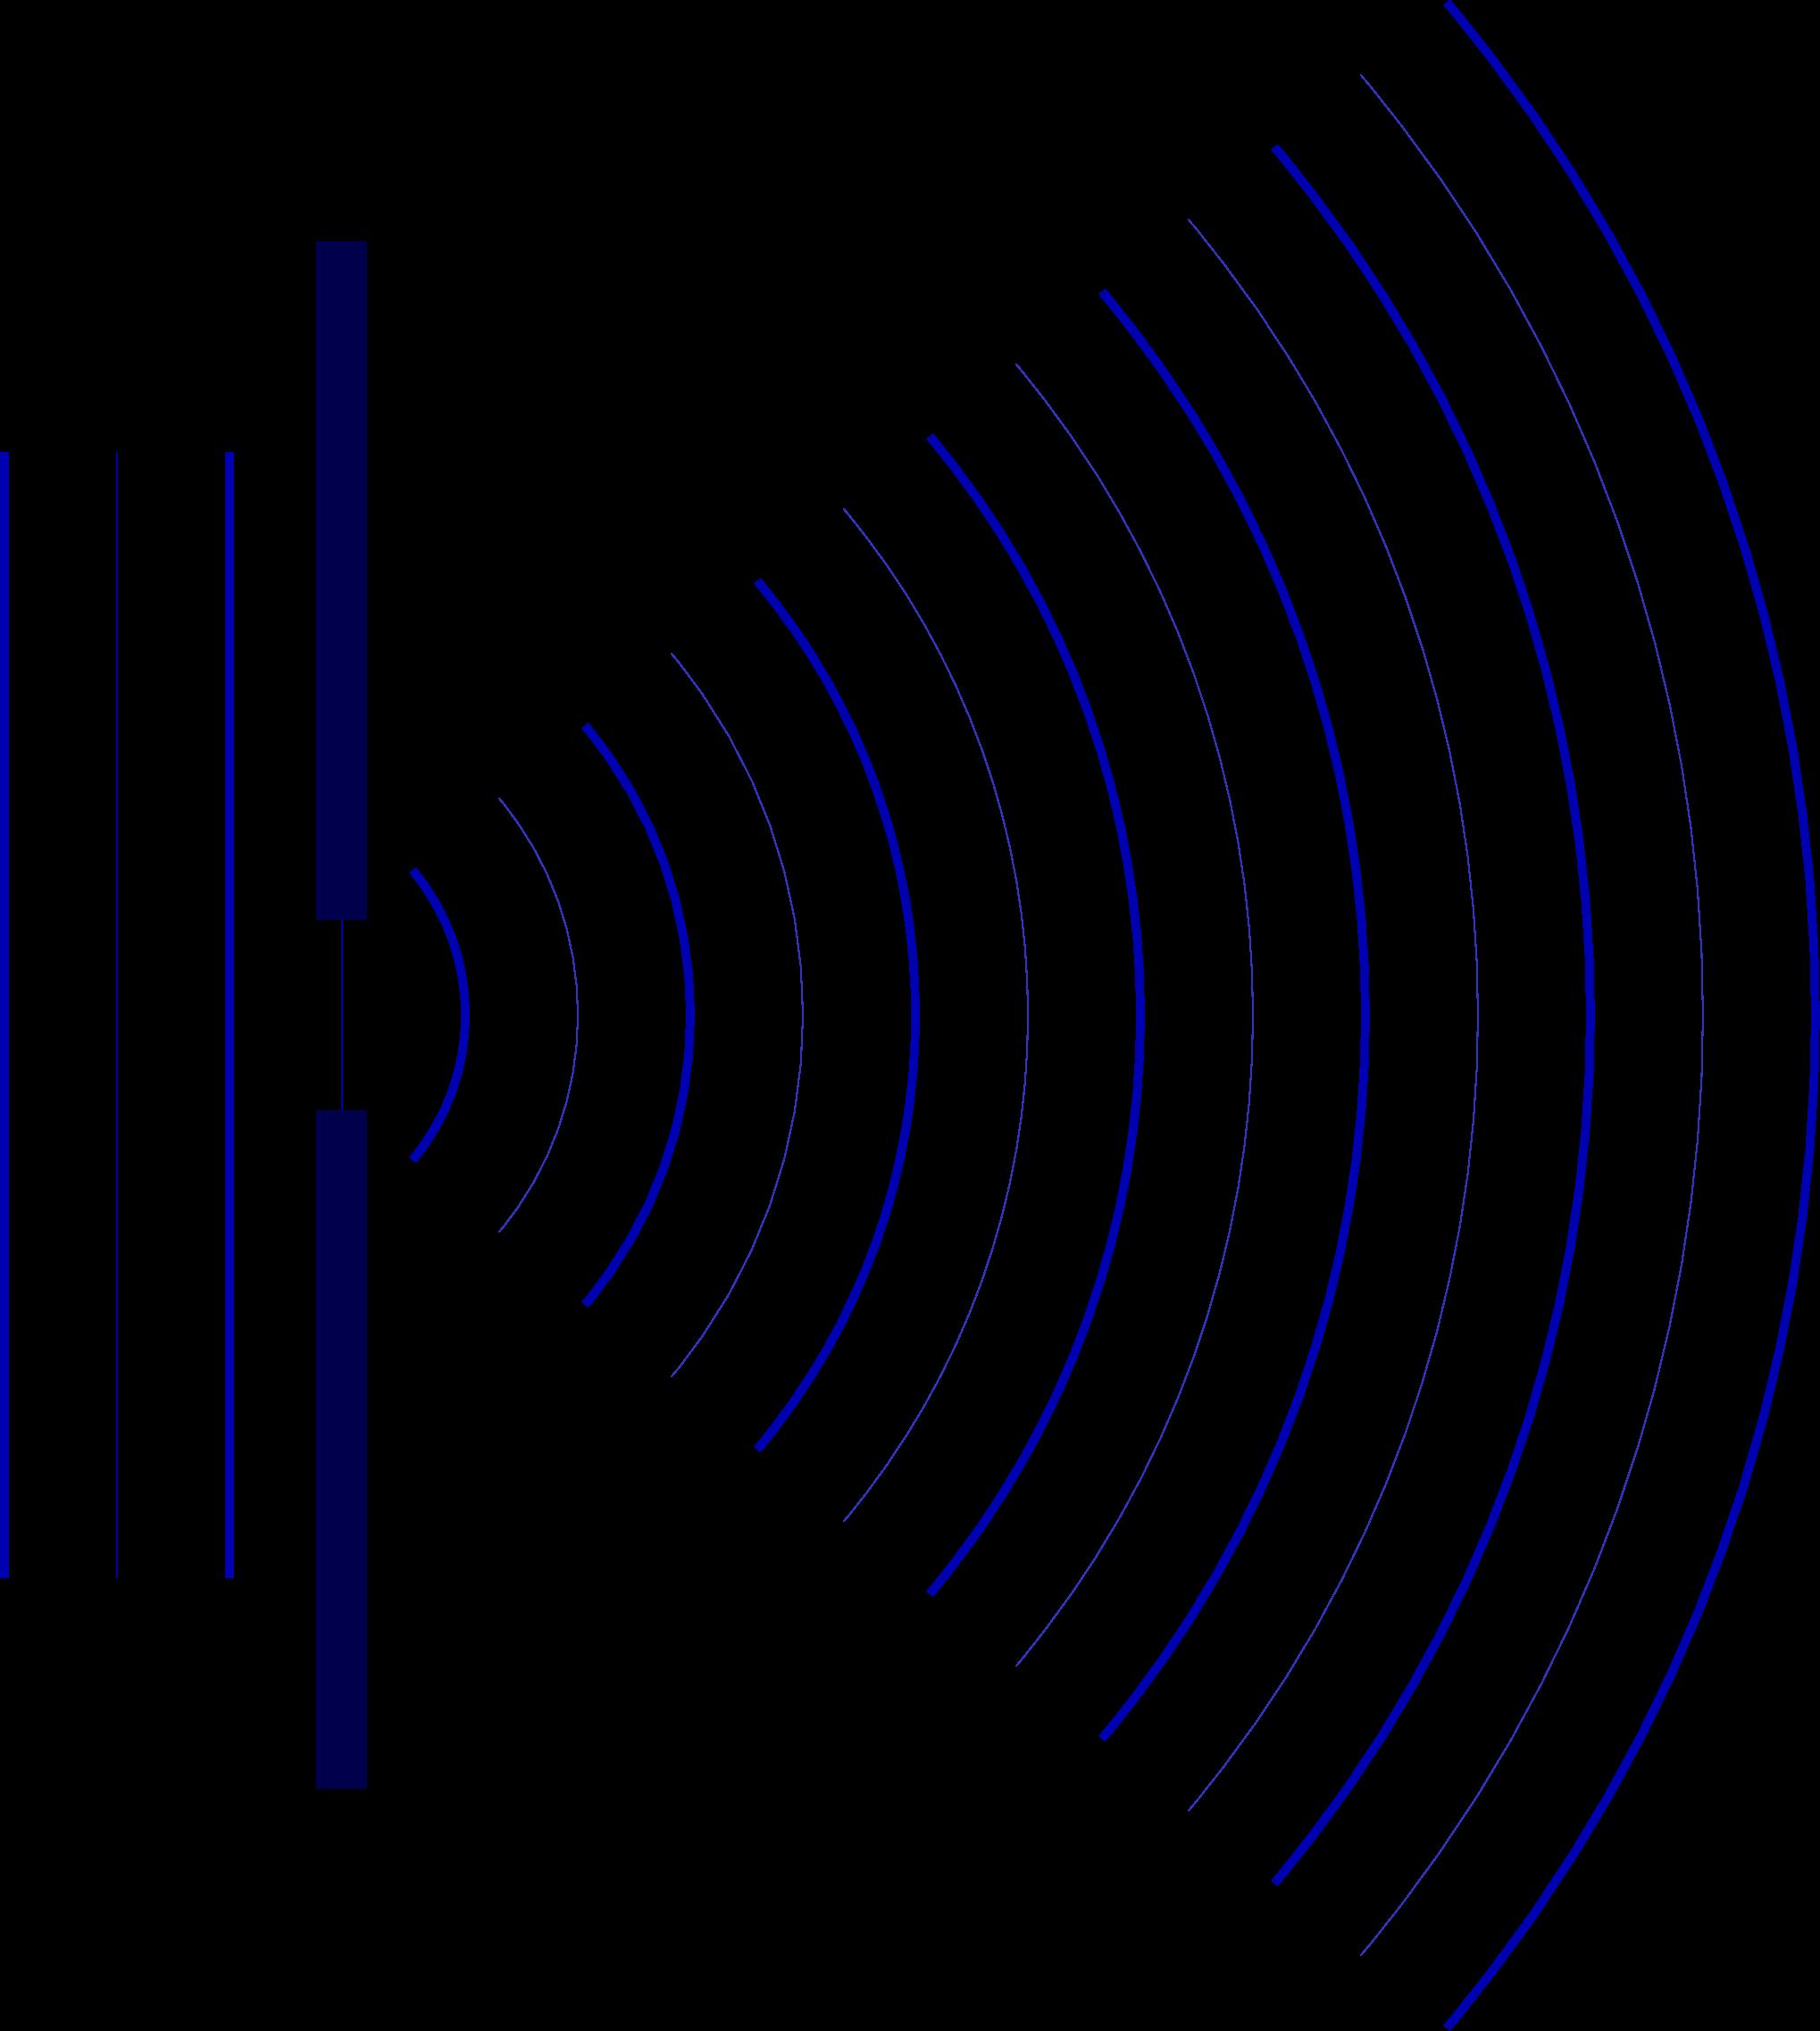 optics_diffraction-005.png